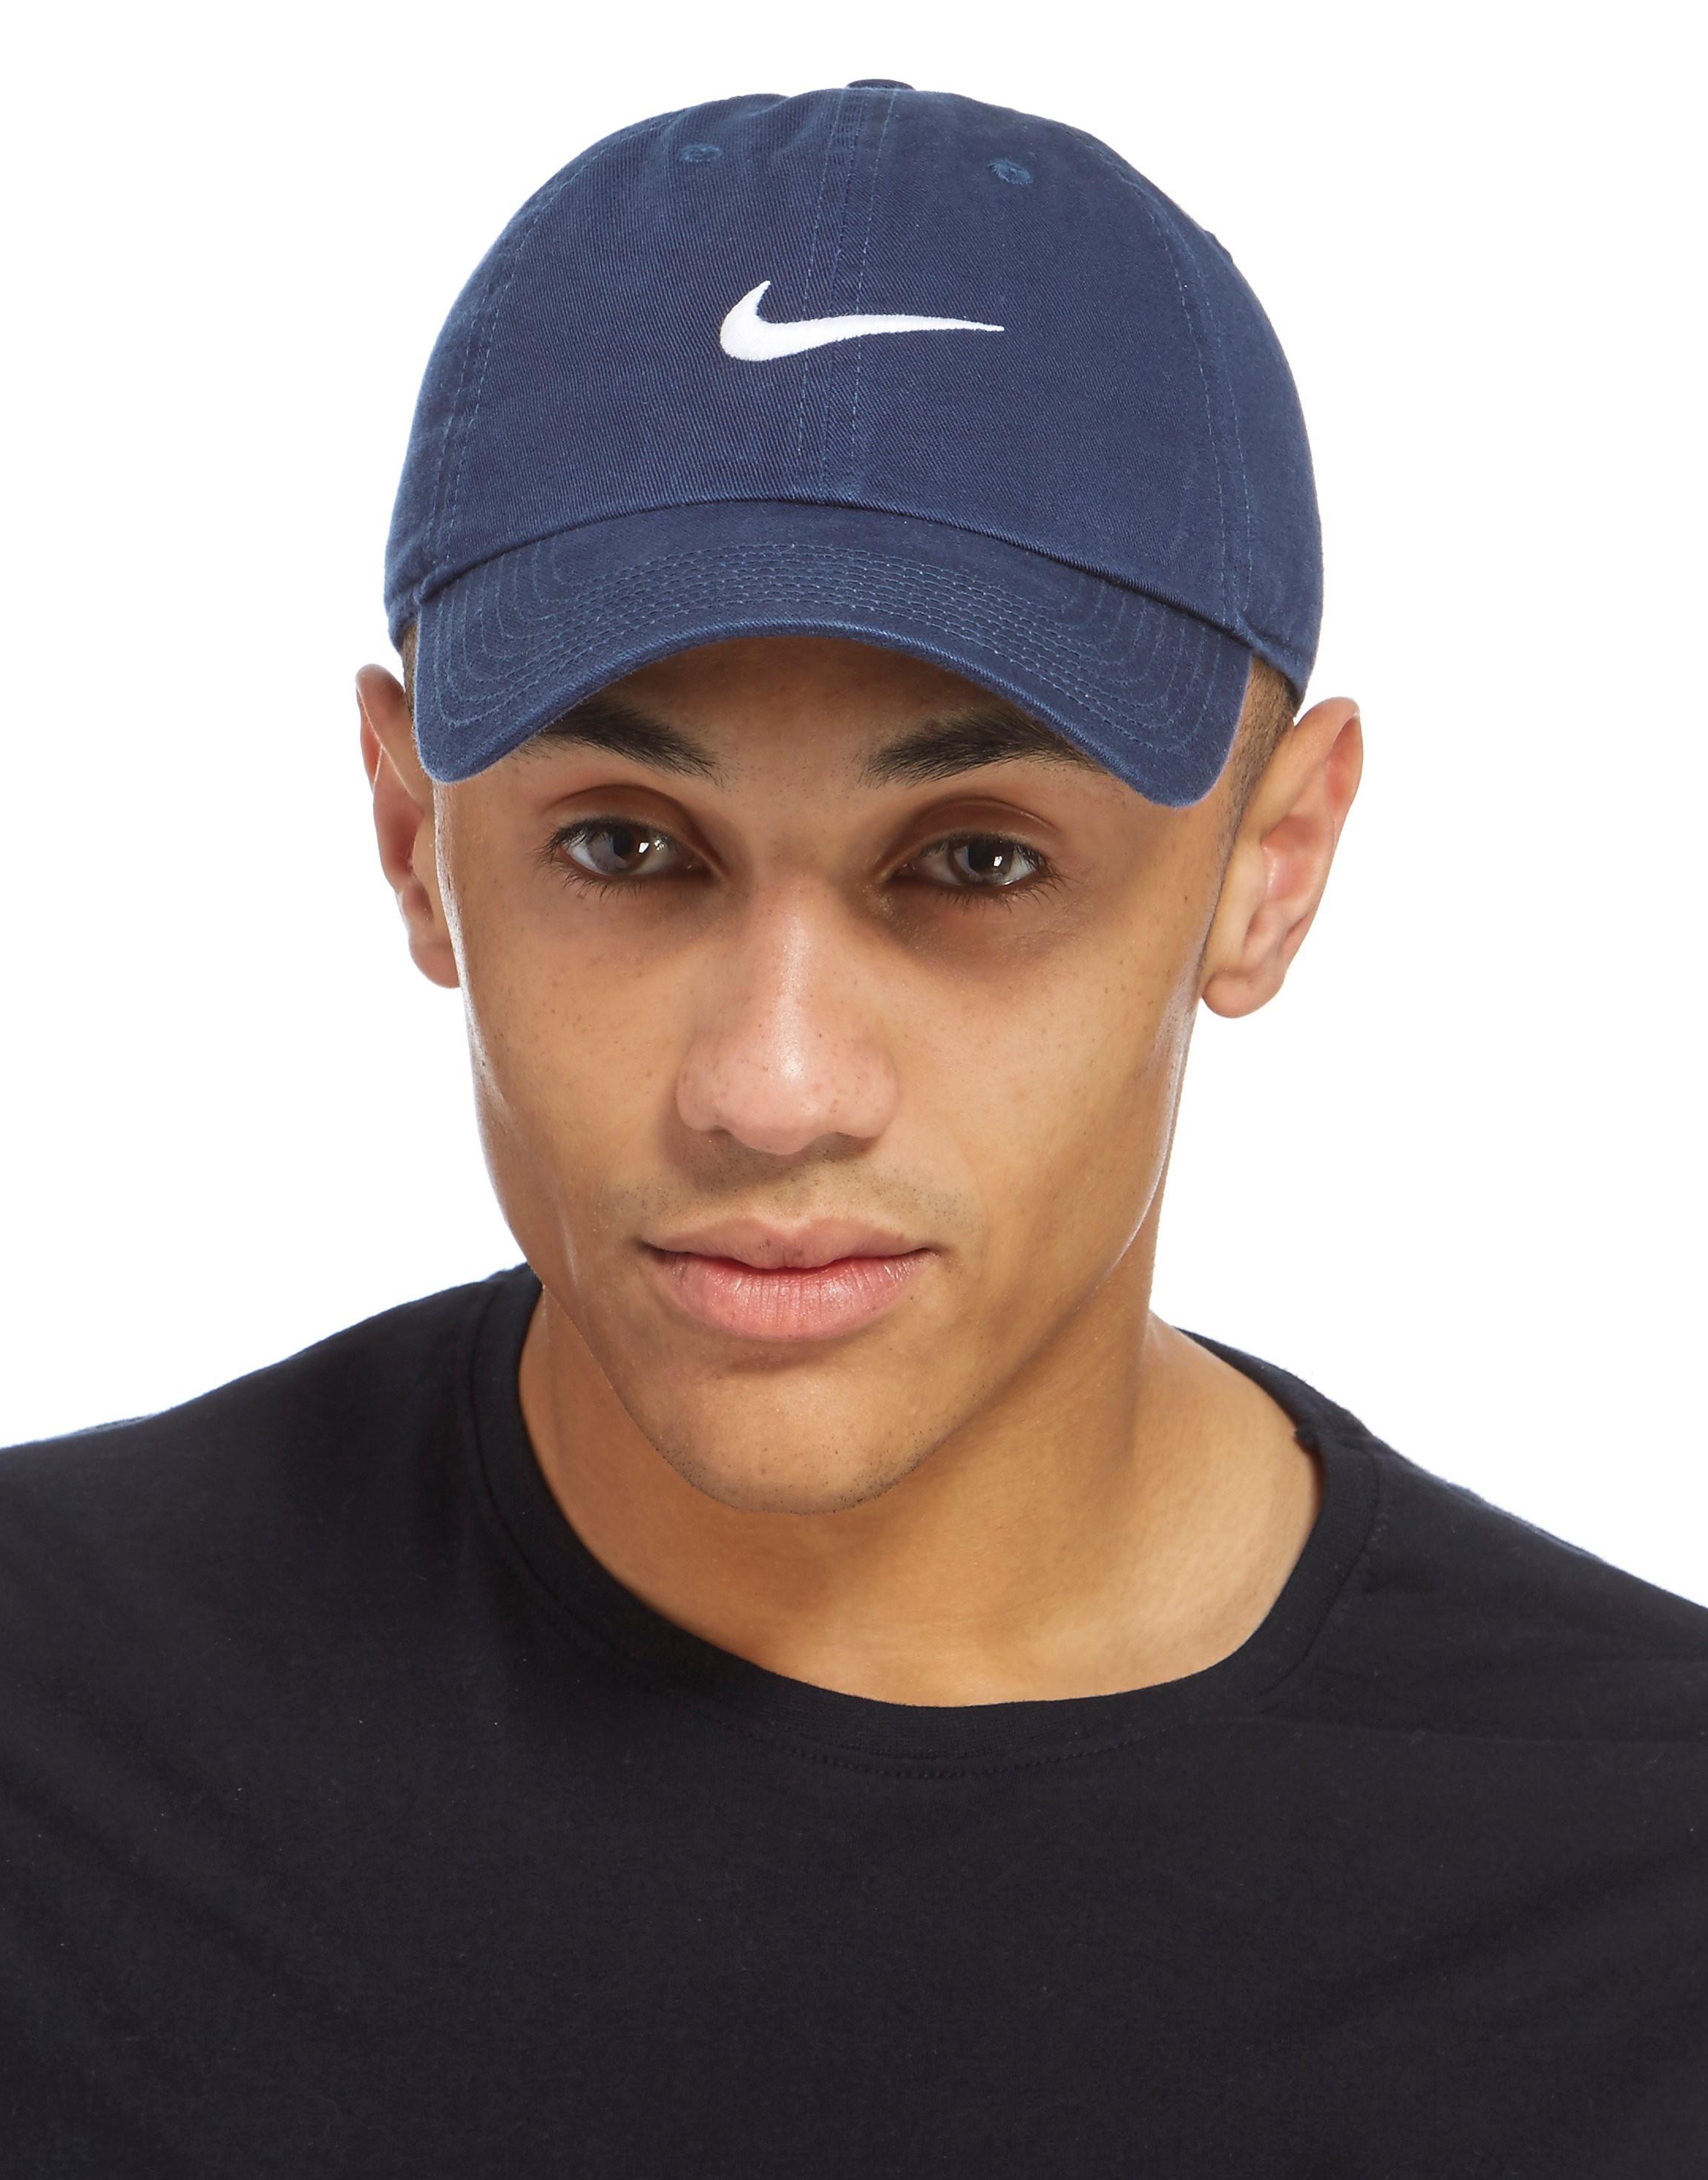 Nike Swoosh 86 keps